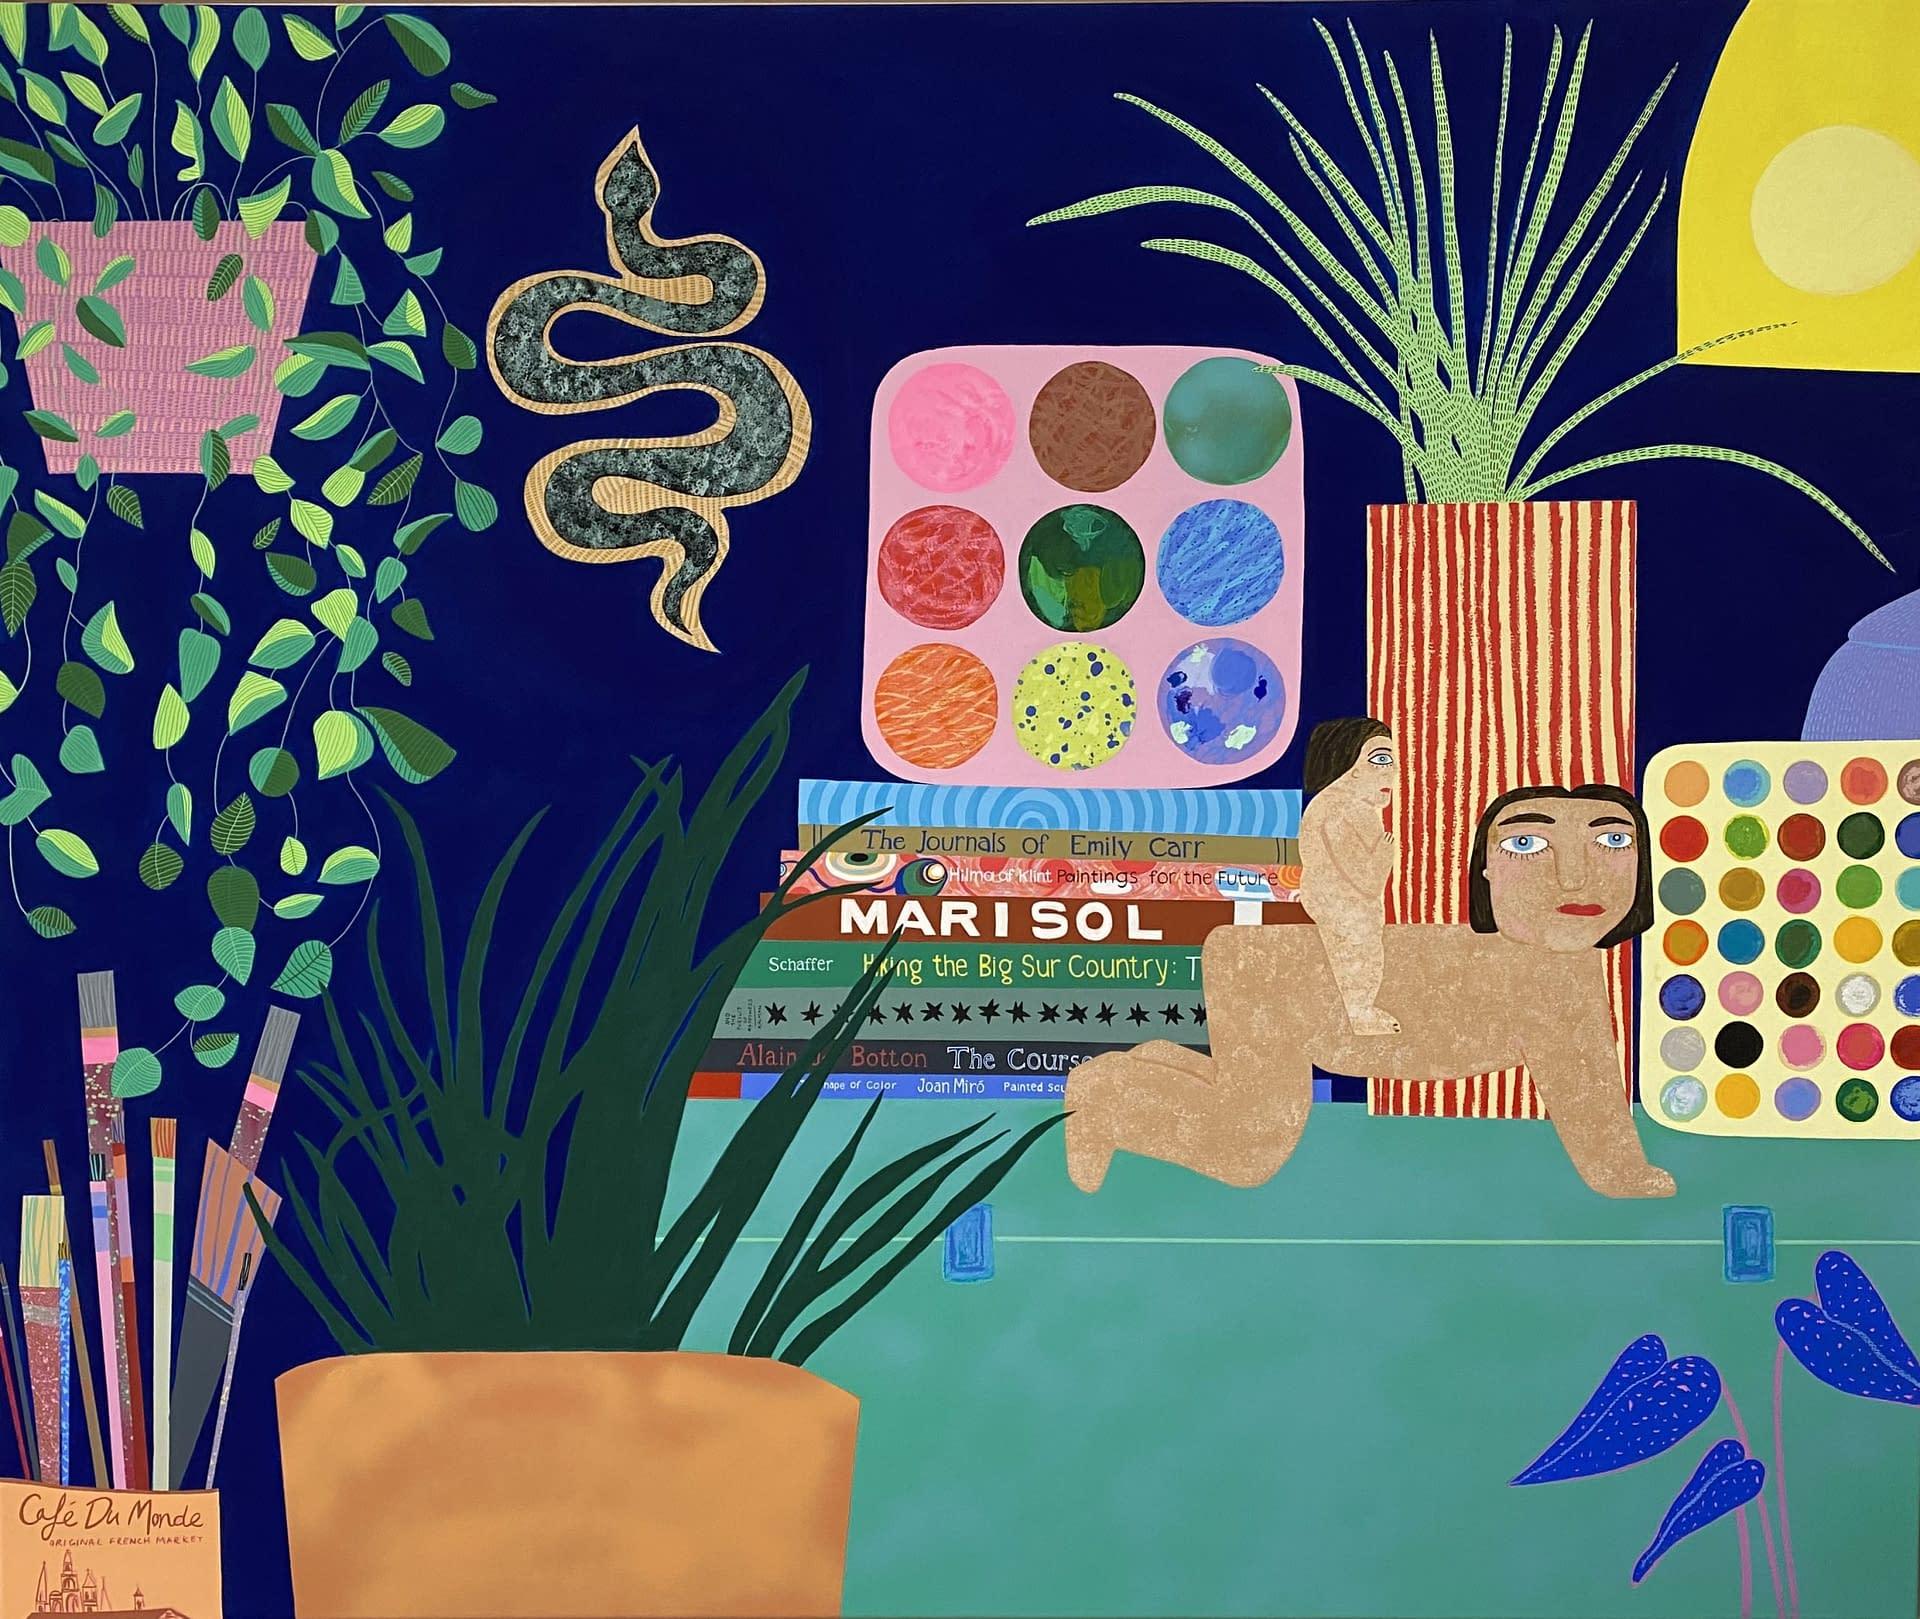 mary finlayson joanneartmangallery 2021 arrival gouache on canvas, spray paint, interiors, still life